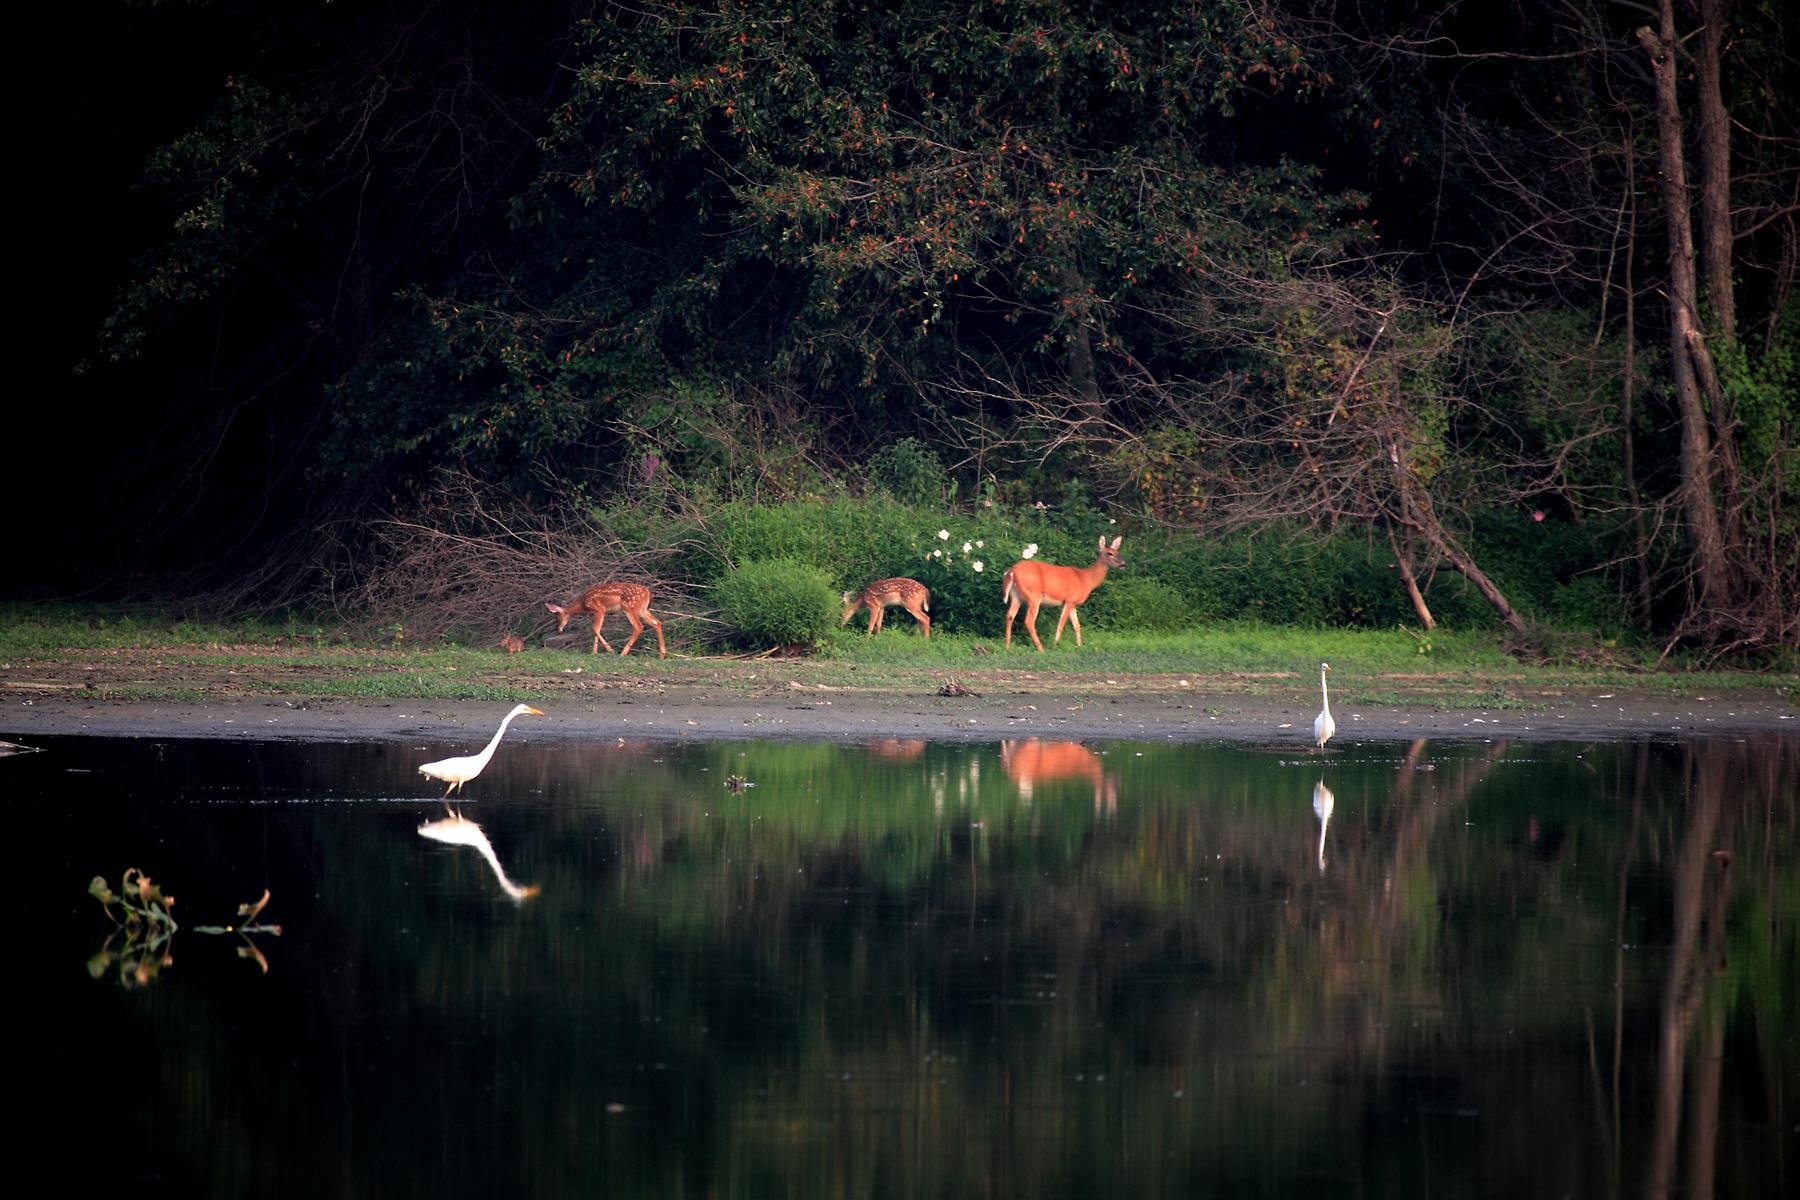 Deer and egrets at John Heinz National Wildlife Refuge in Philadelphia, Pennsylvania.     Credit: Ron Holmes/USFWS